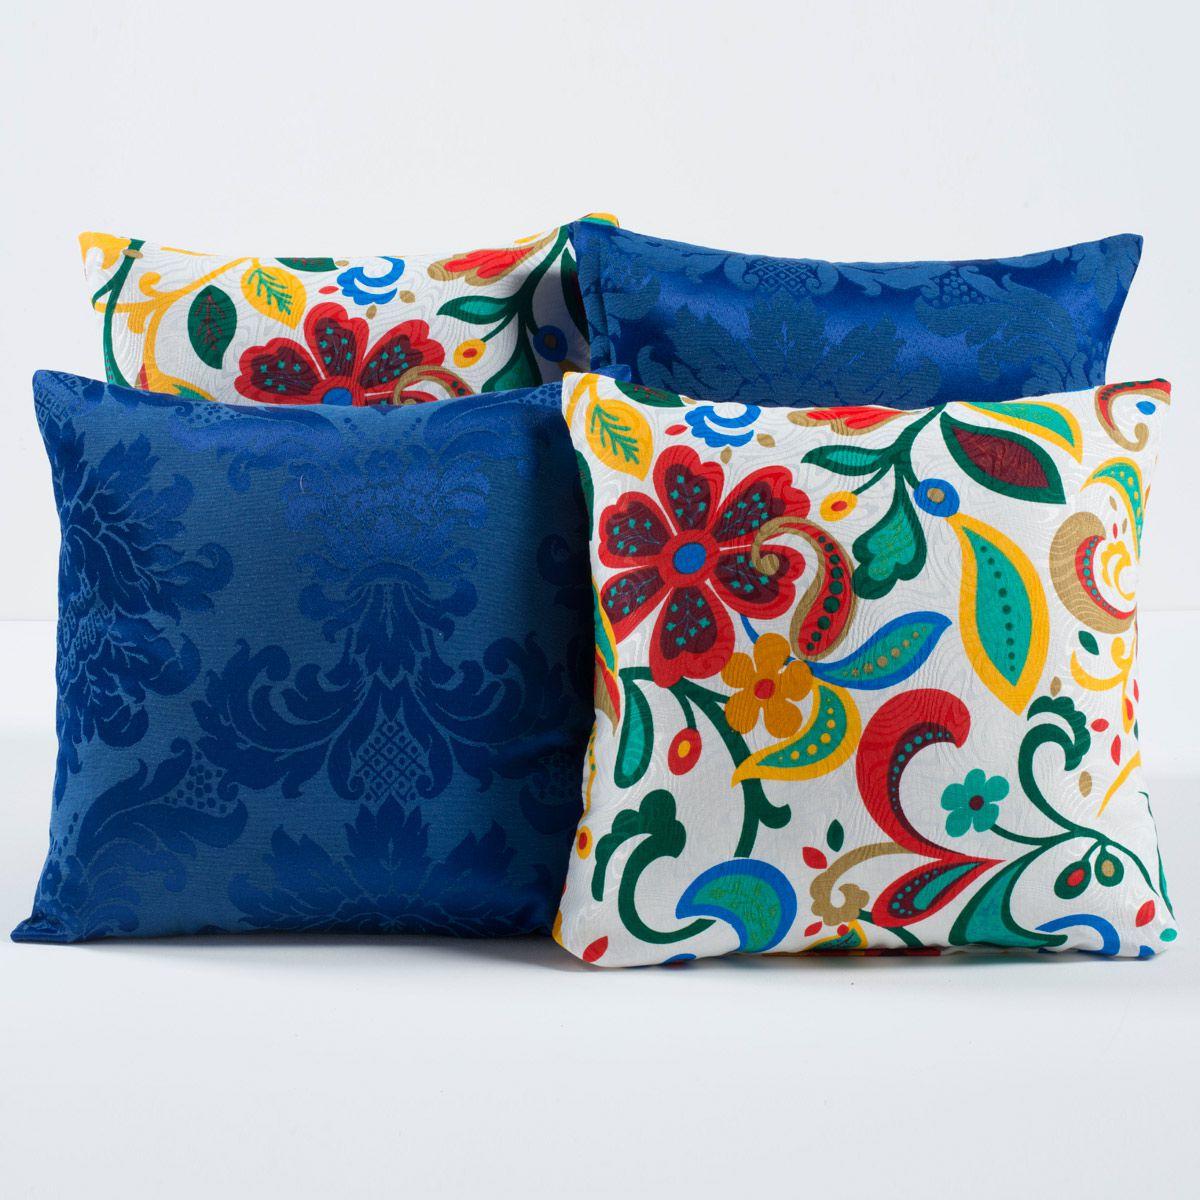 Kit c/ 4 Almofadas Cheias Decorativas Floral Azul/Branco 04 Peças c/ Refil